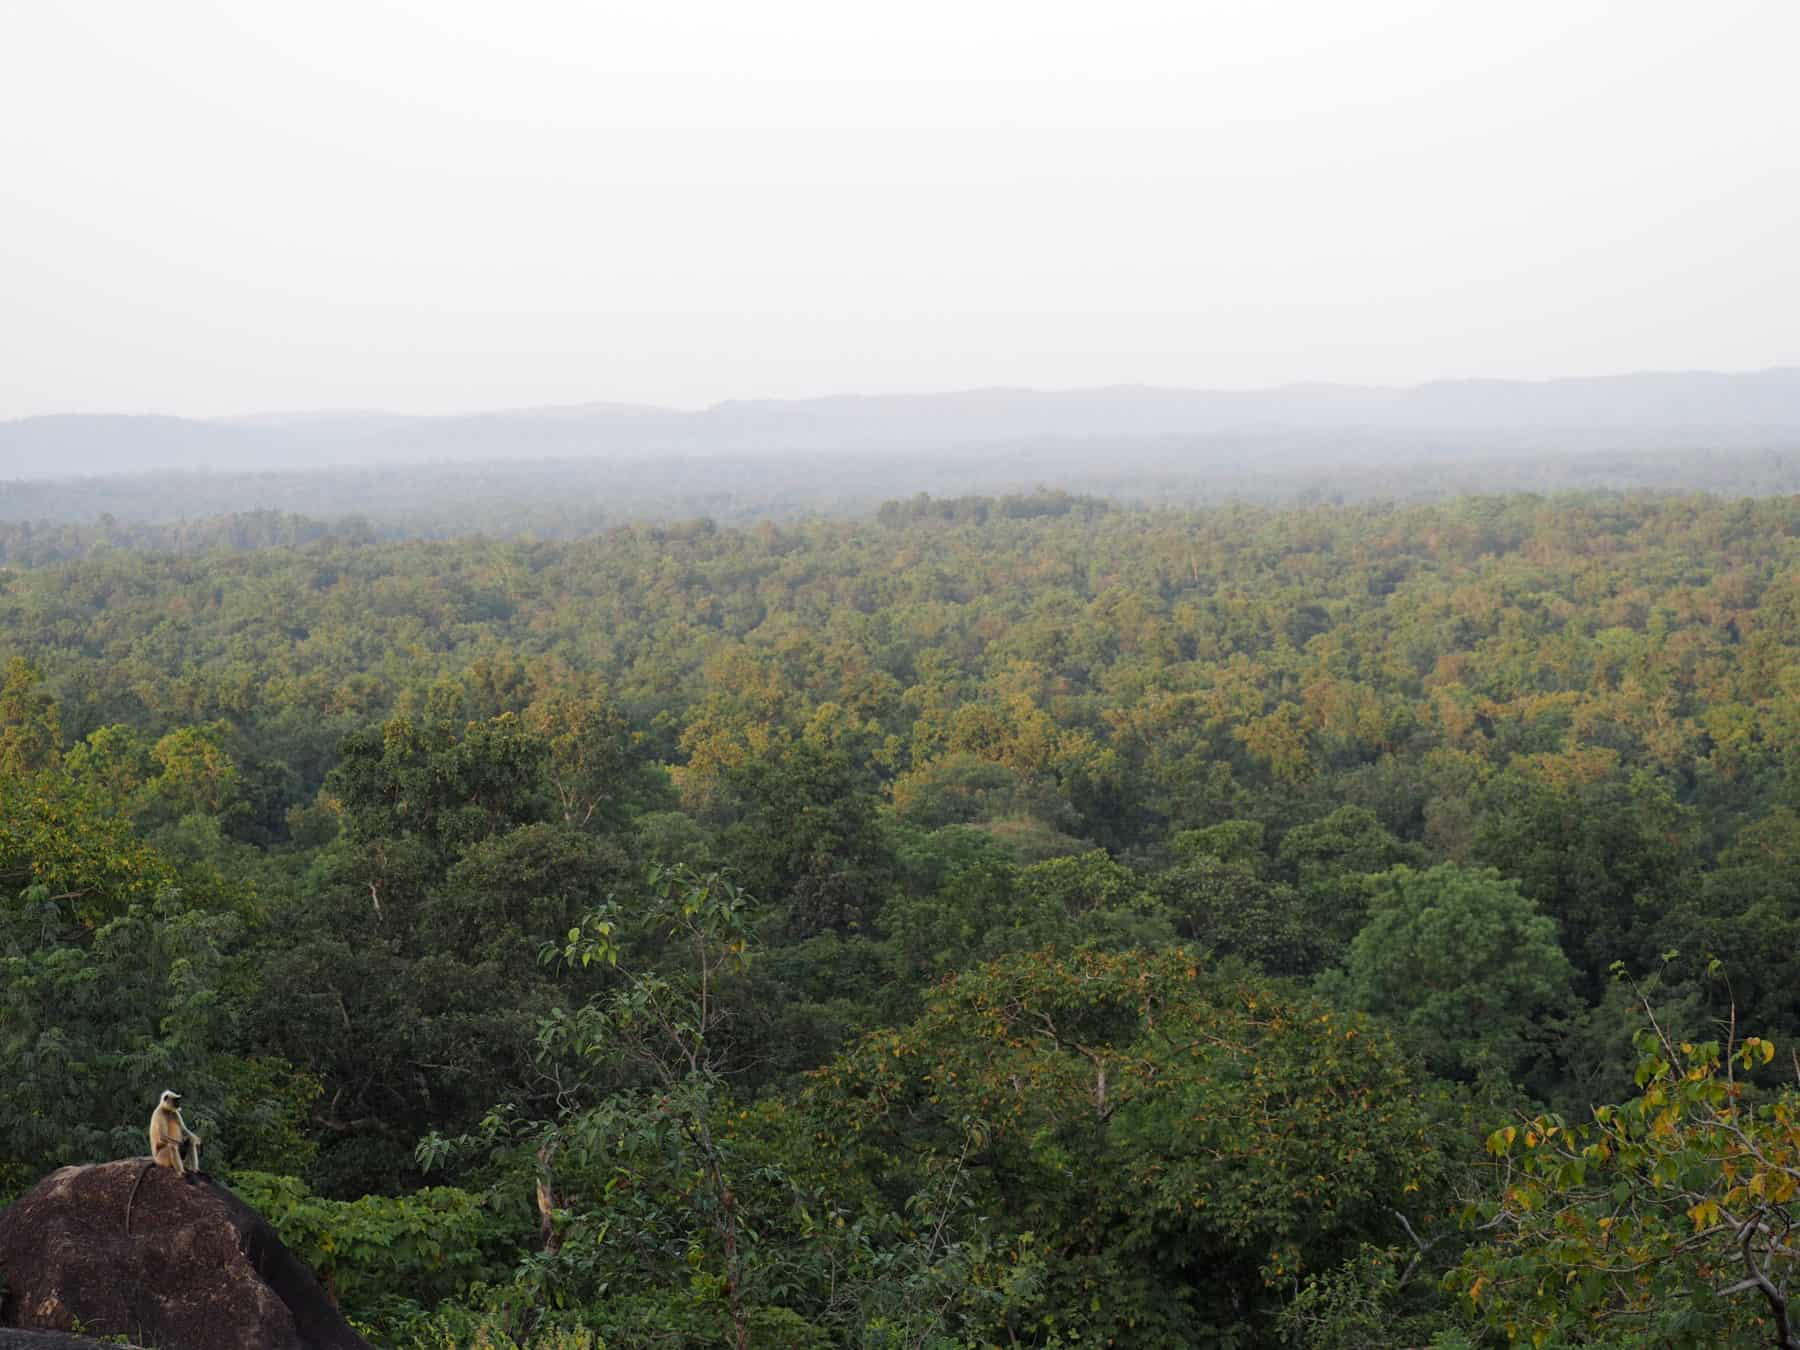 Langur in Kanha National Park